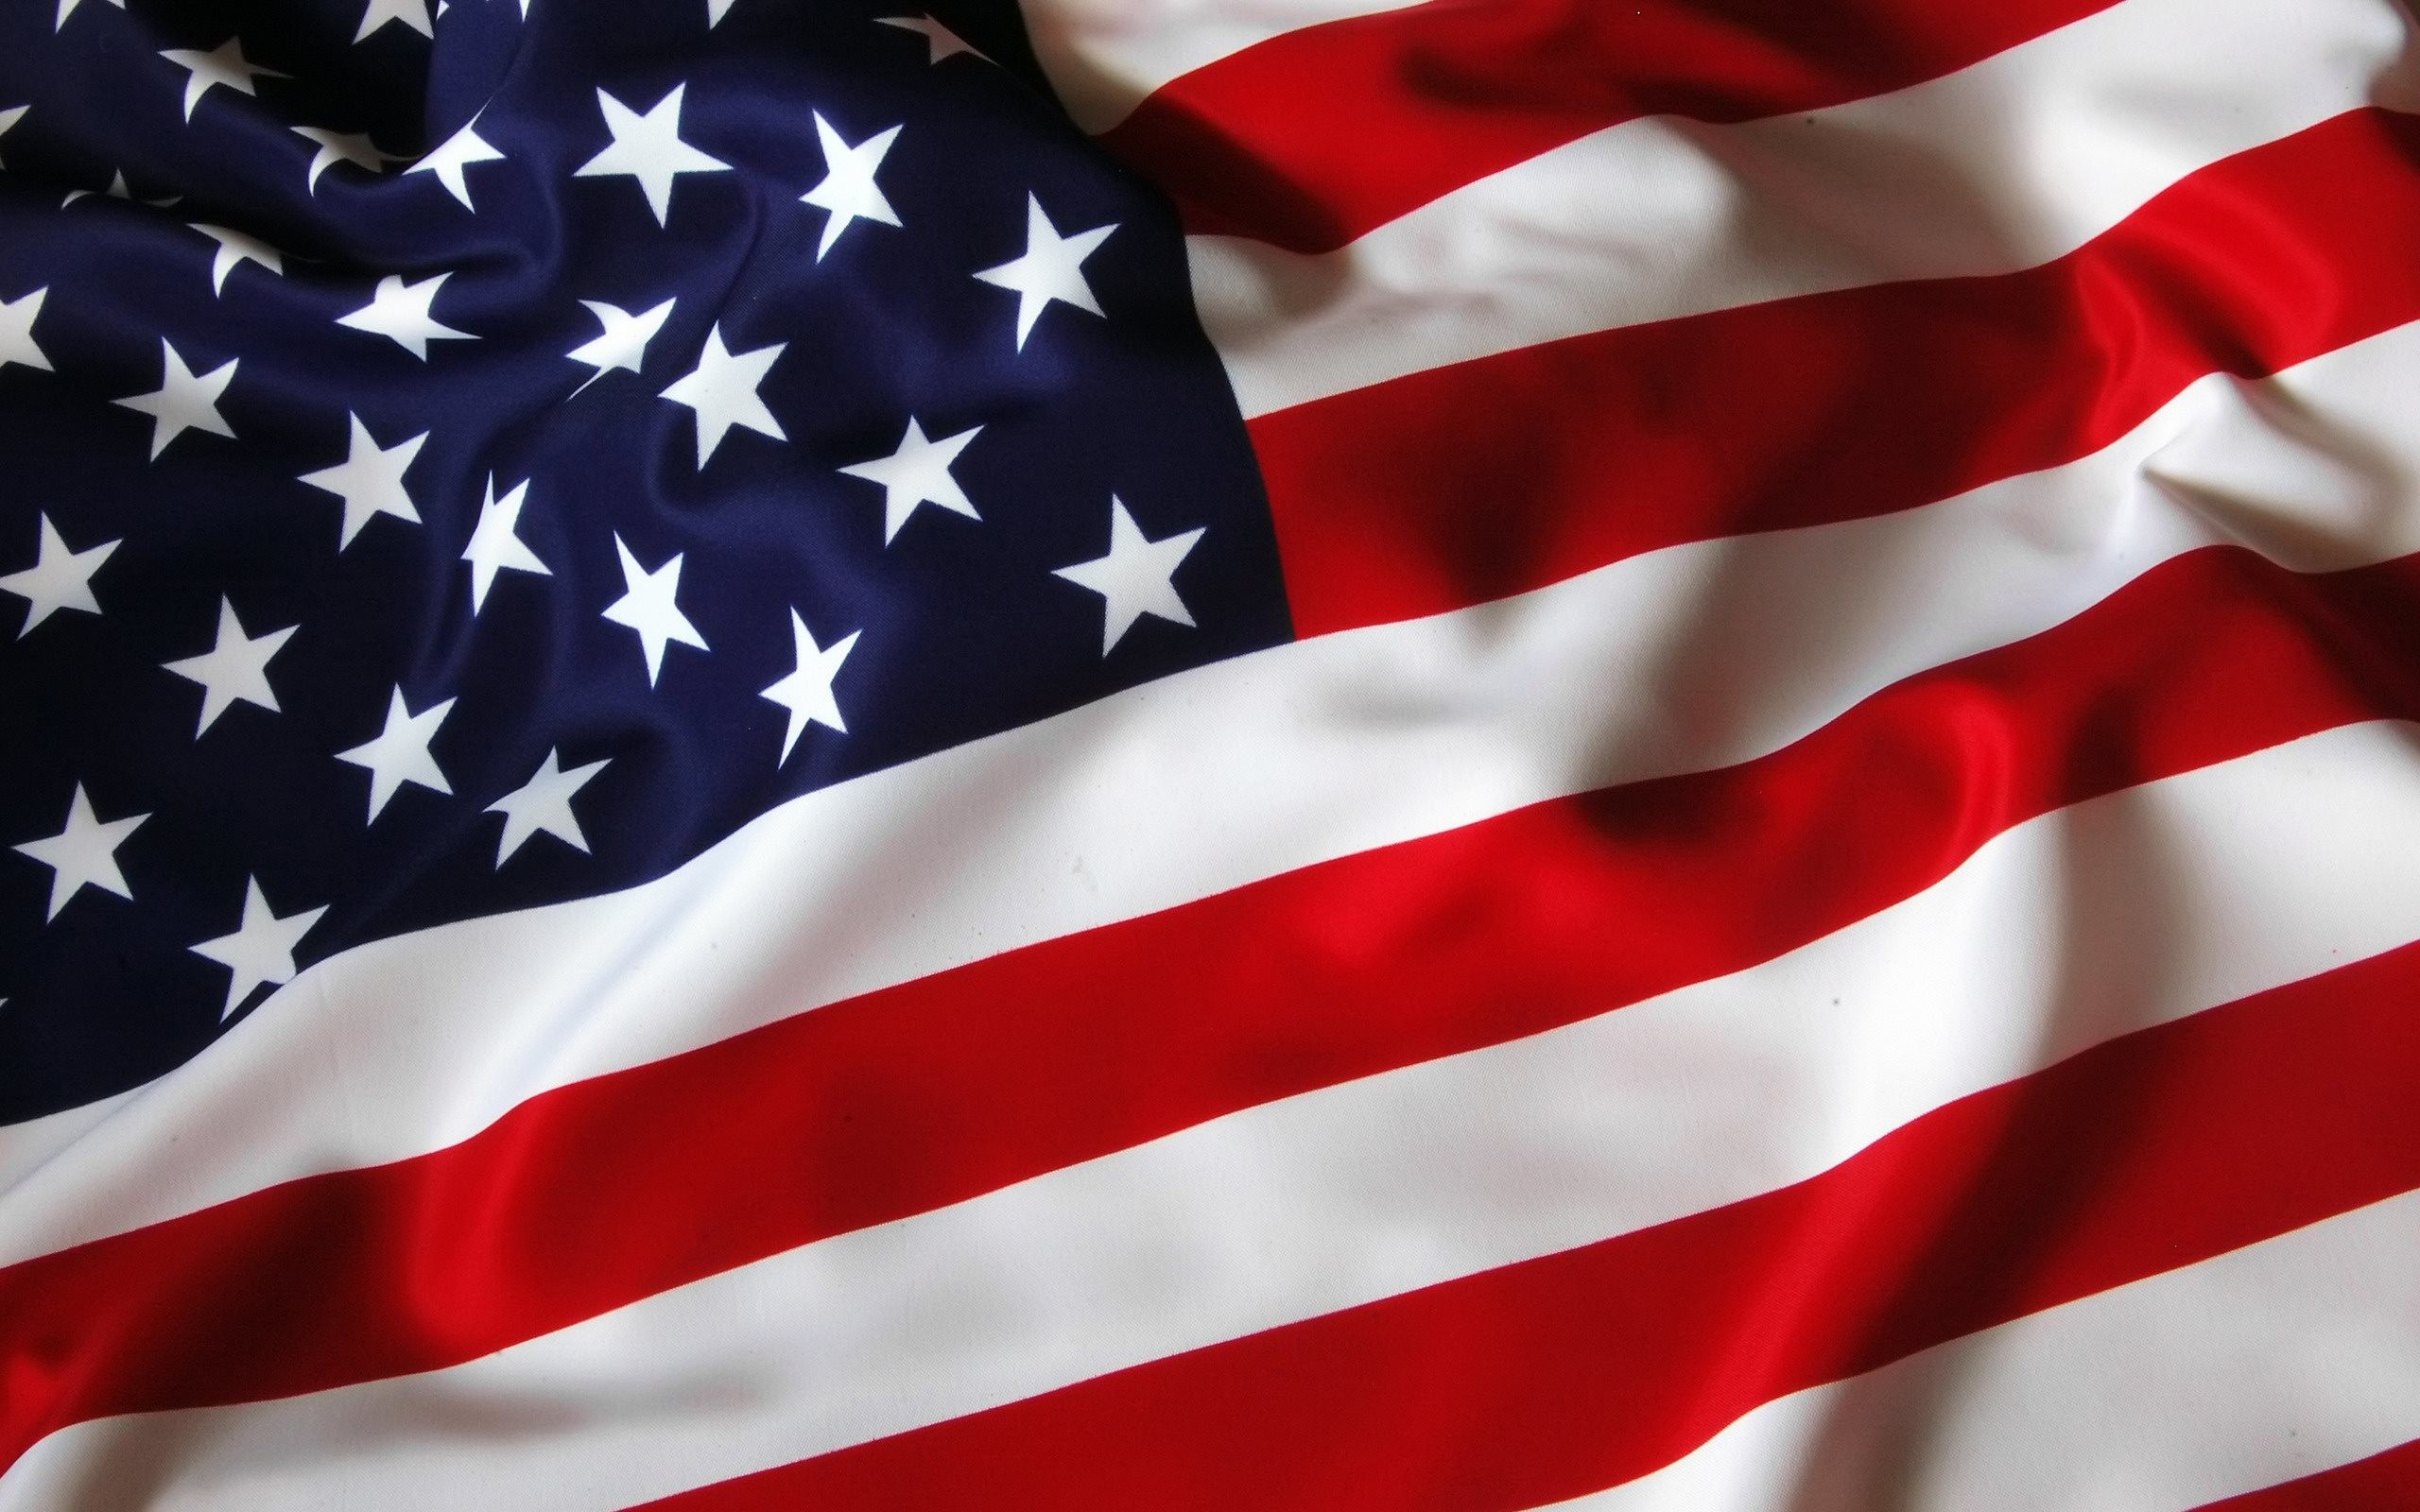 american-flag-high-resolution-wallpaper | wallpapers55.com – Best .